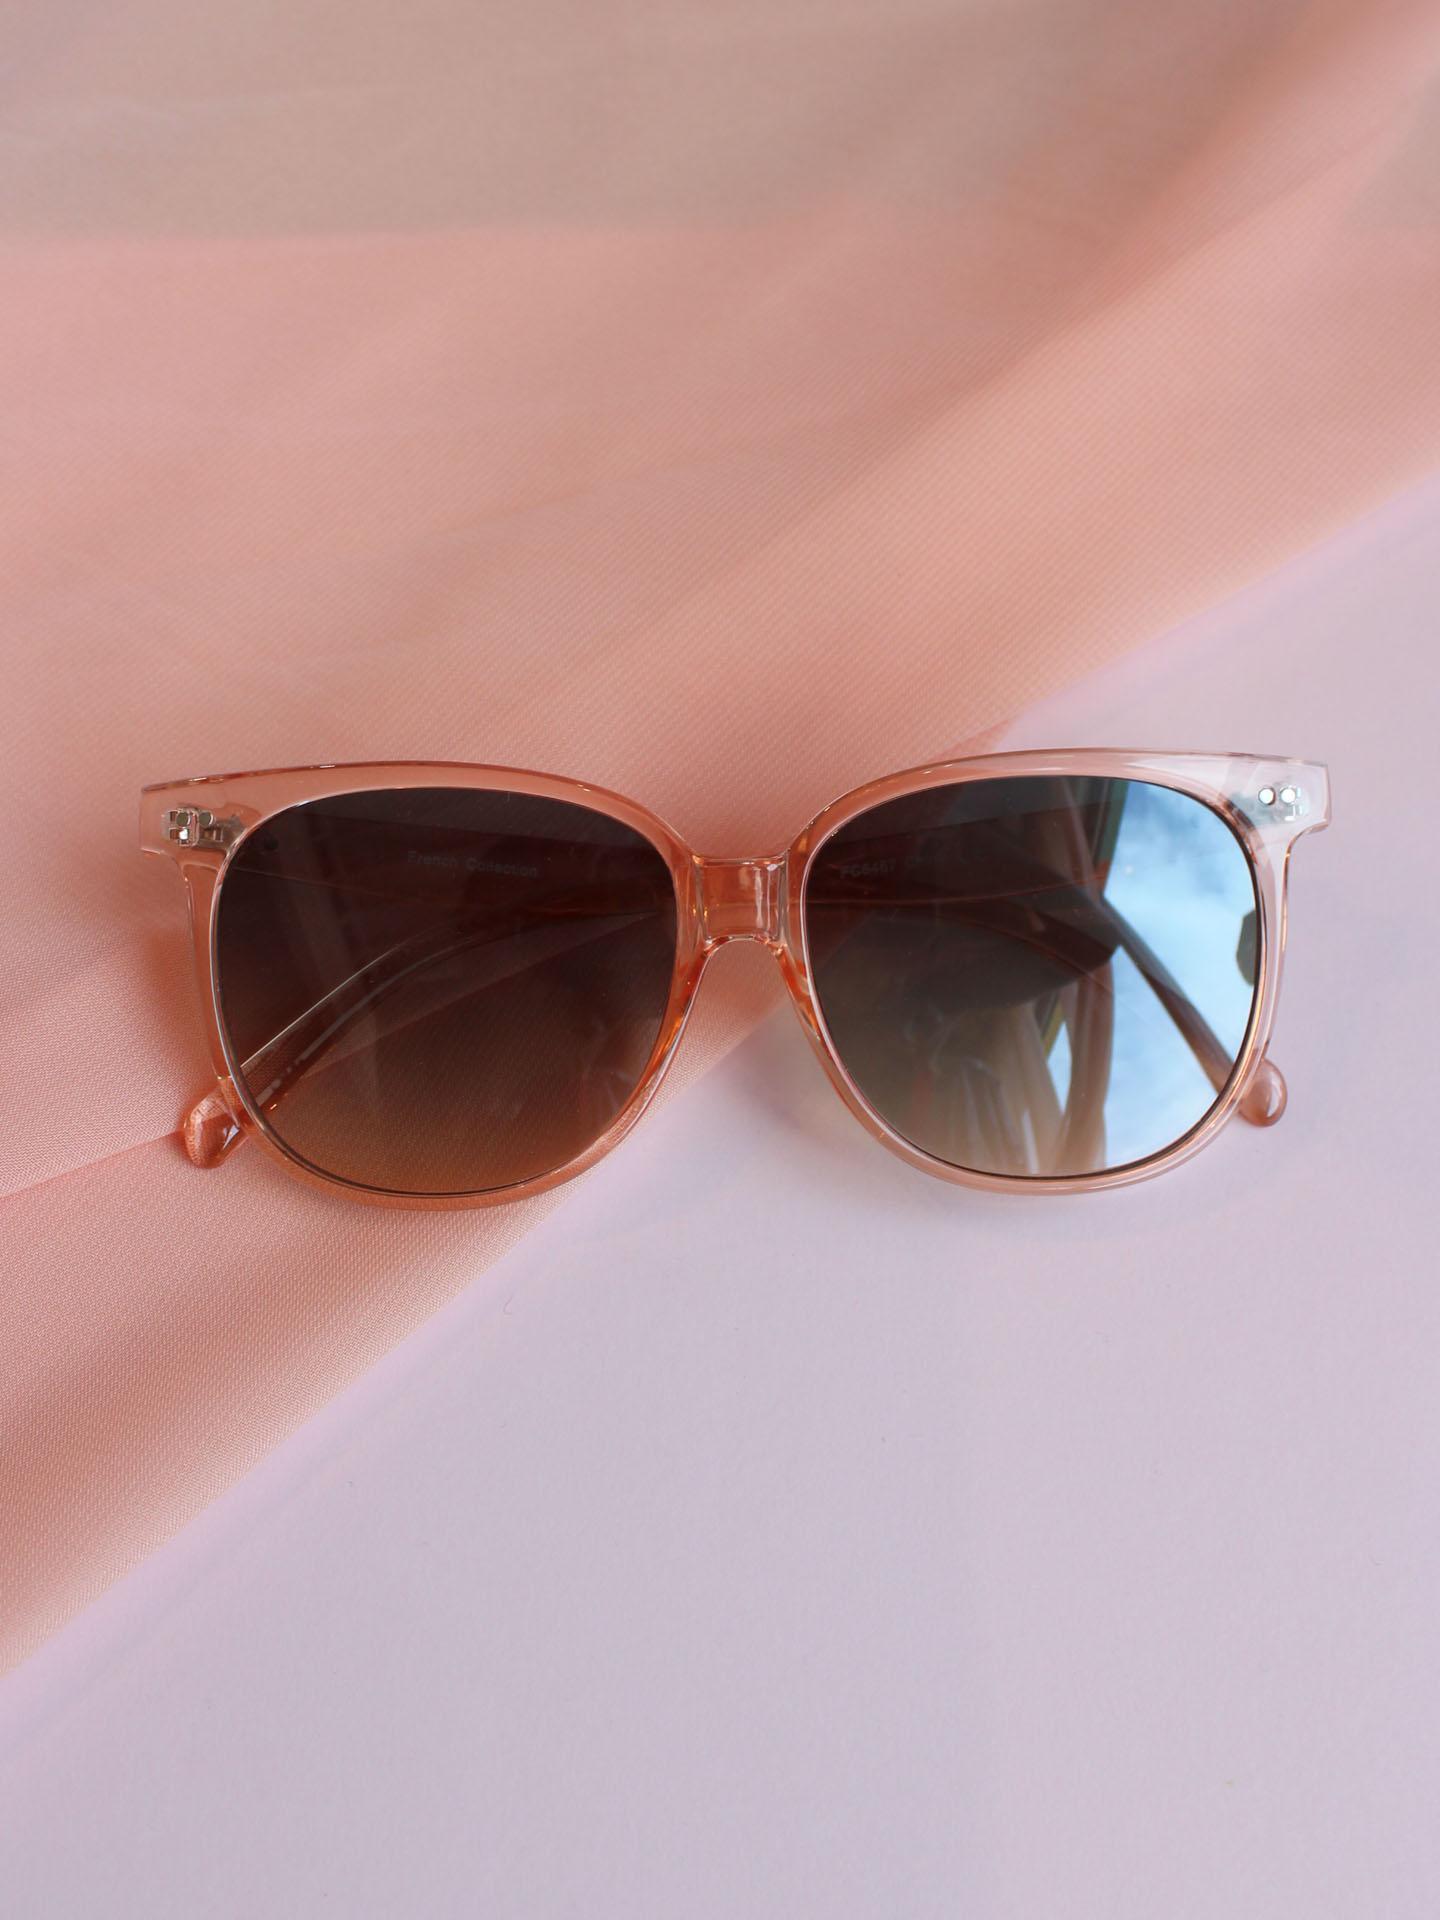 Levant Sunnies Pink